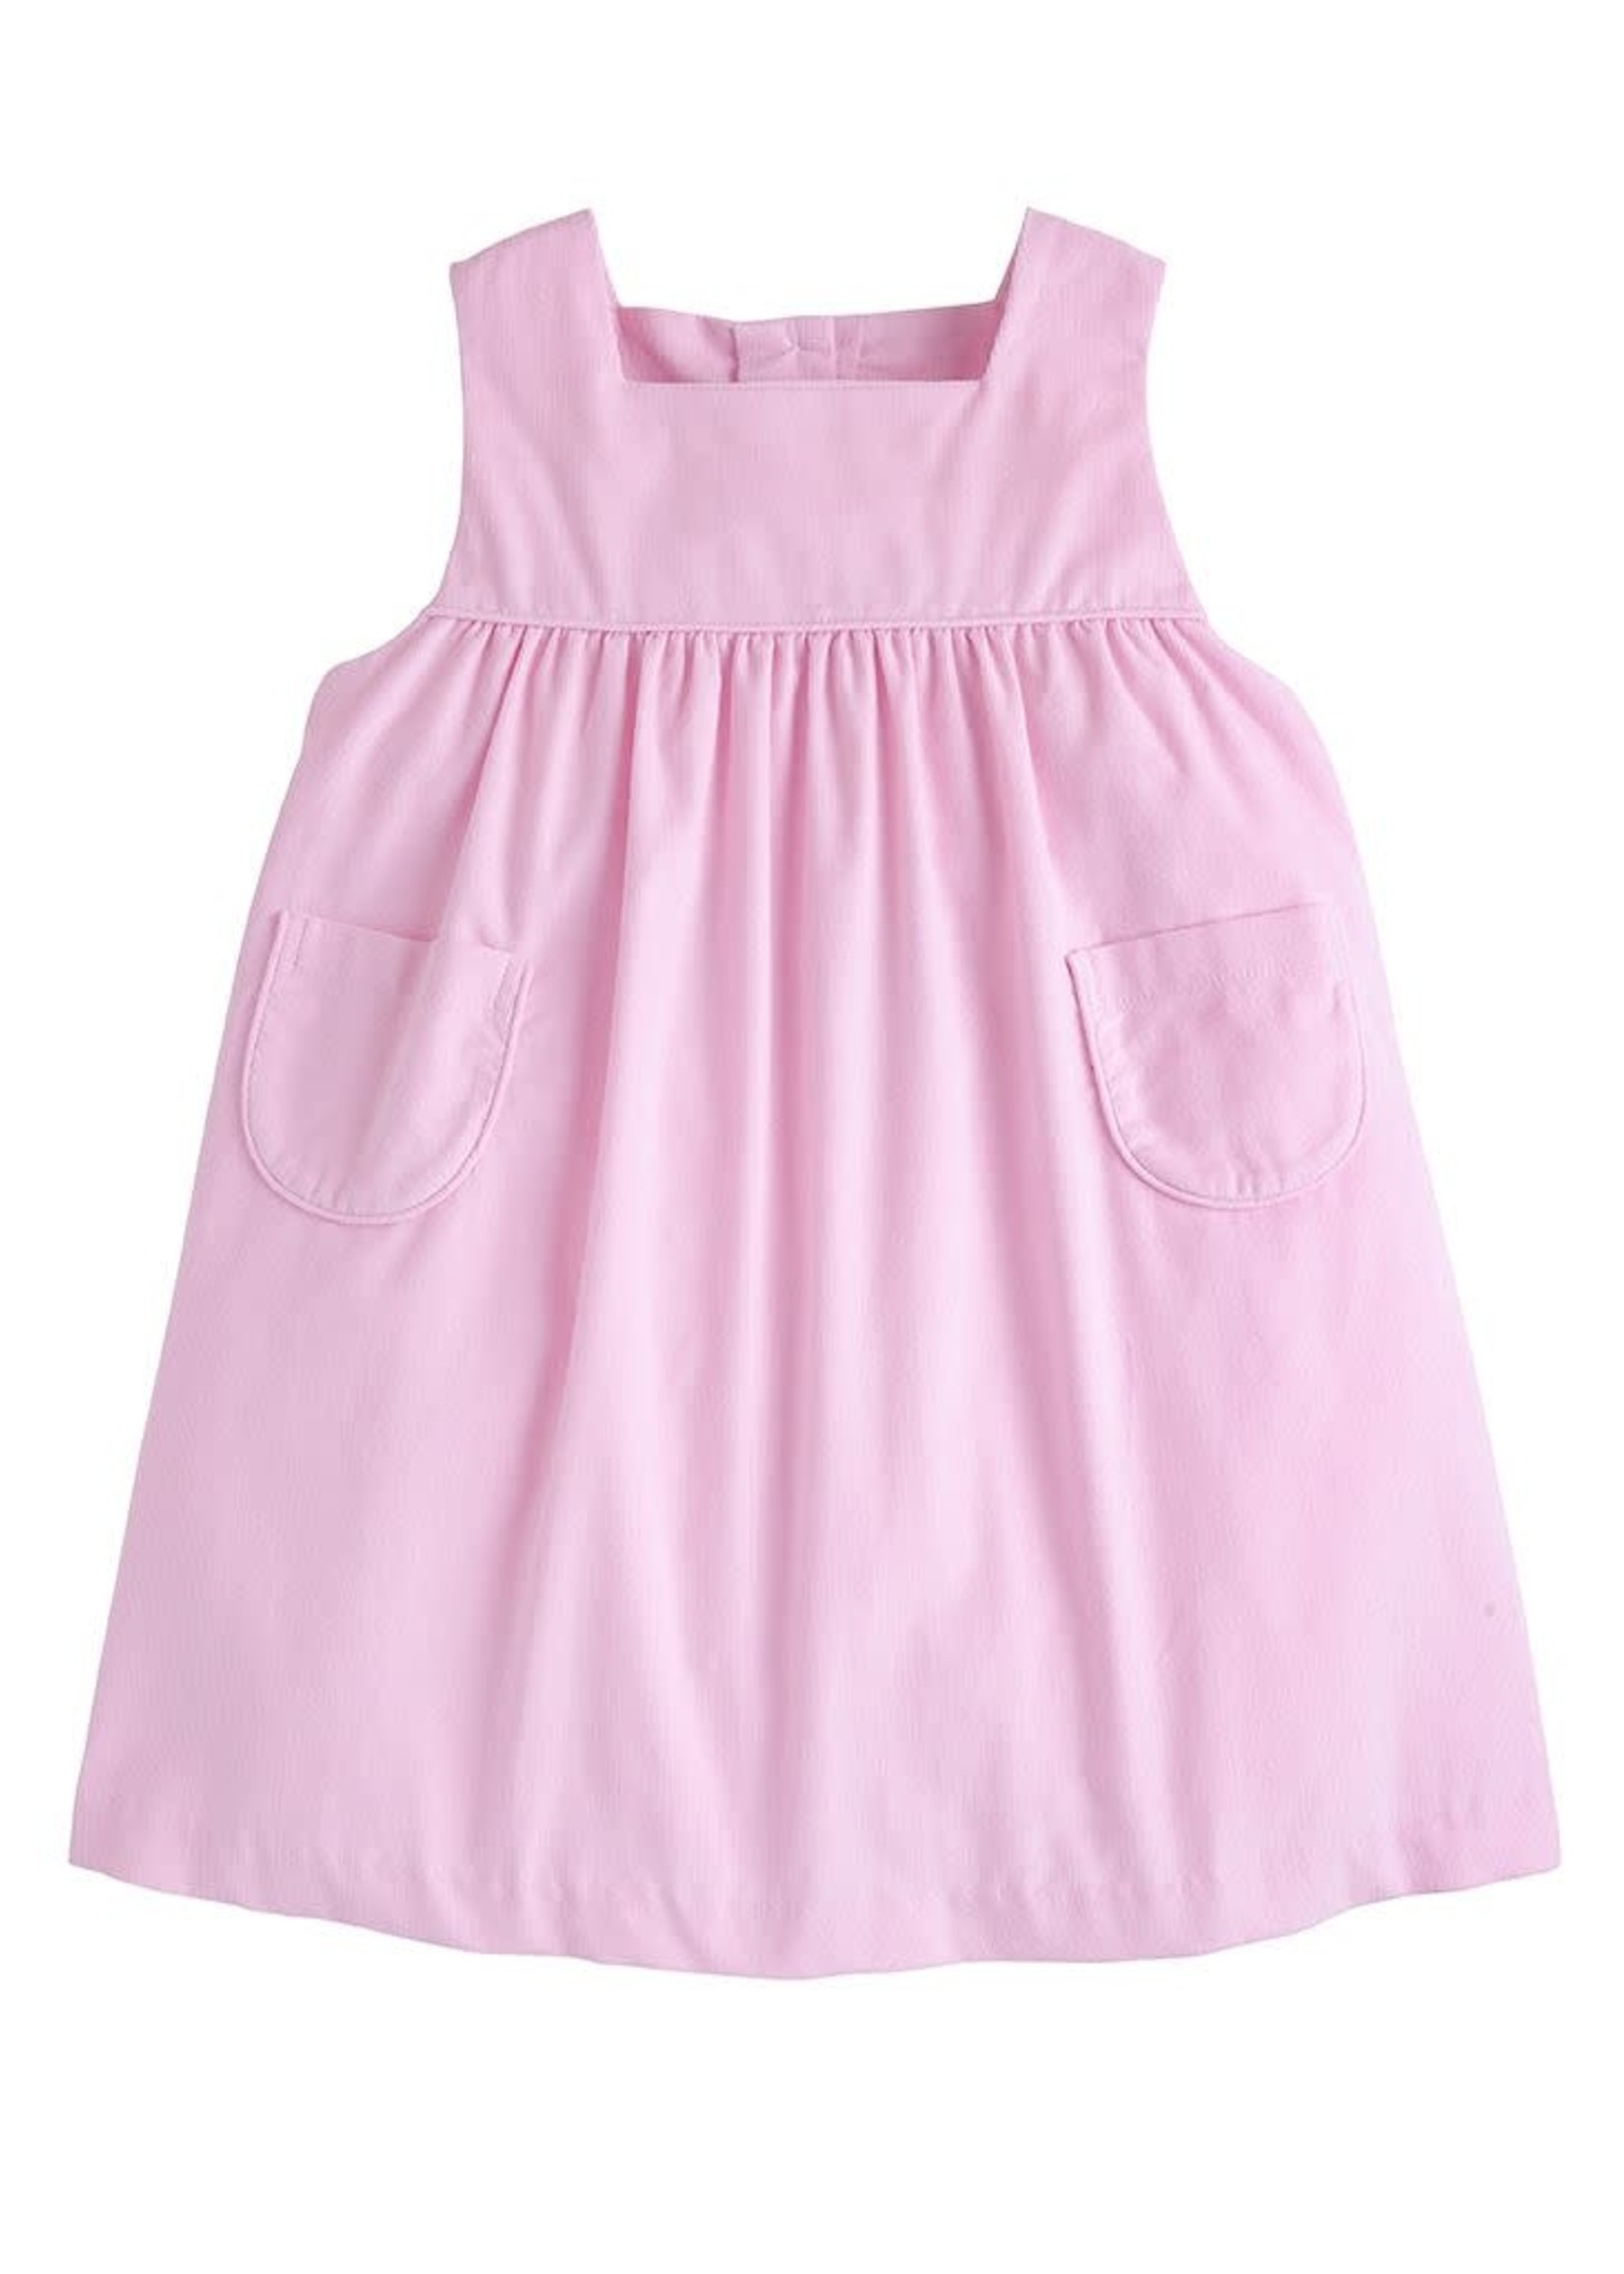 Little English Madison Jumper - Light Pink Corduroy